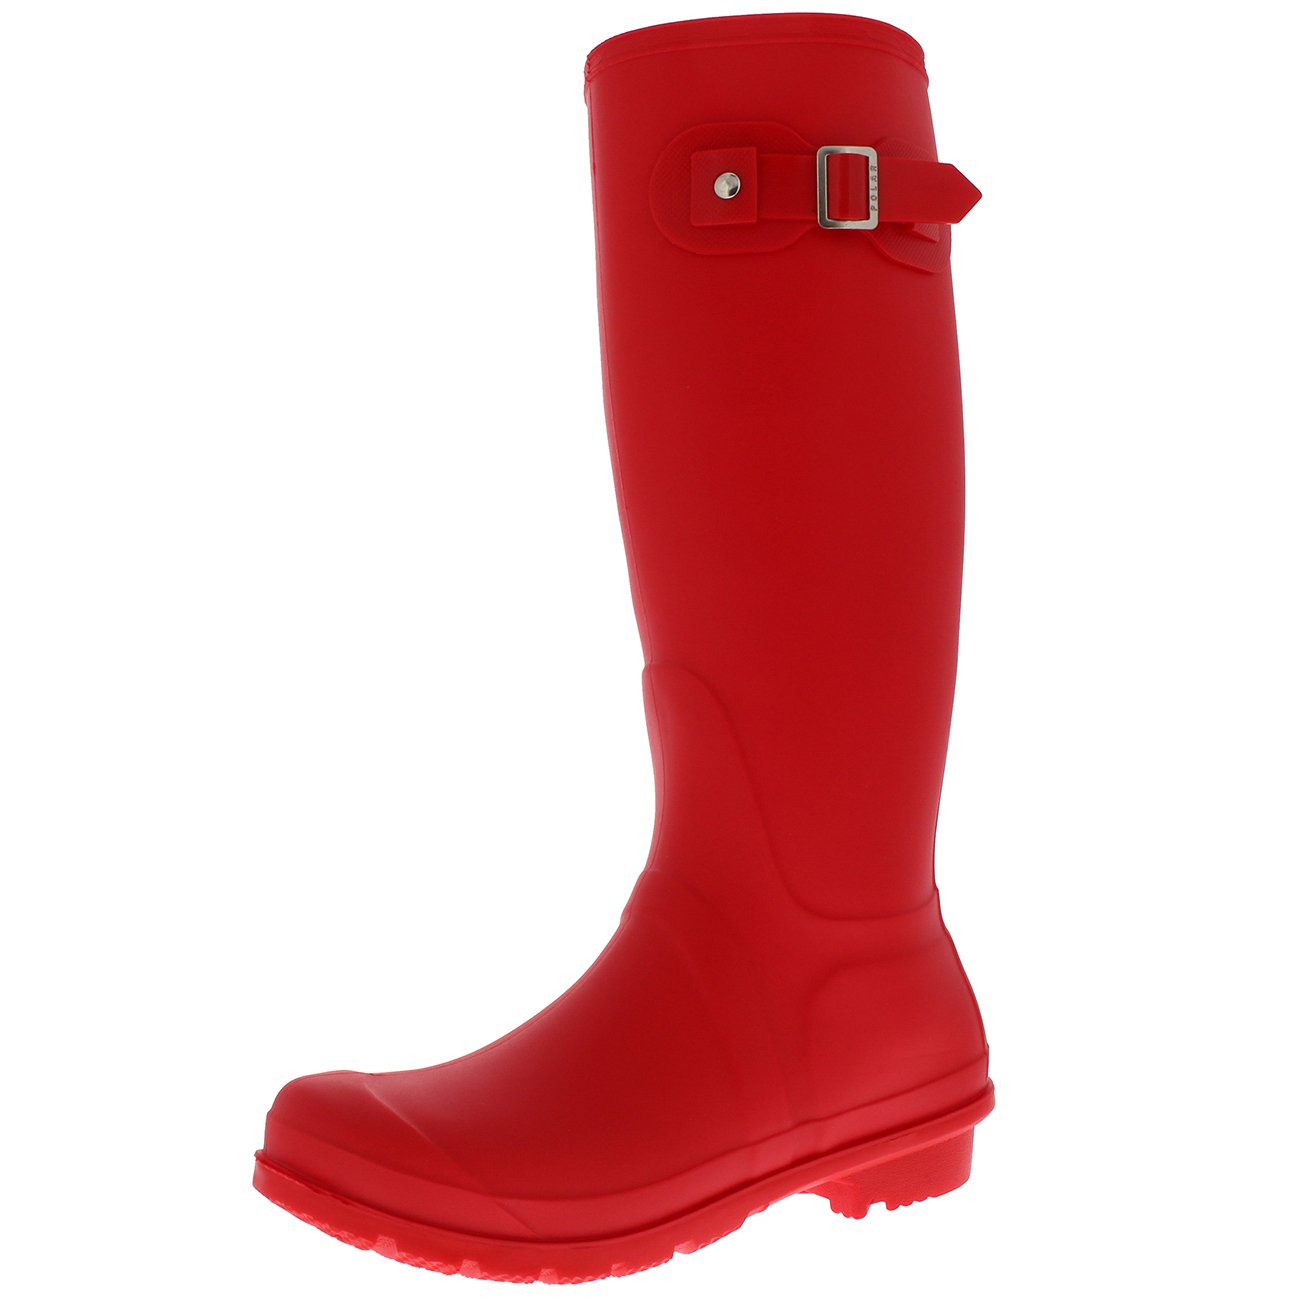 Womens Snow Tall Waterproof Rain Muck Dog Walking Buckle Wellington Boot - Red - US8/EU39 - BL0293